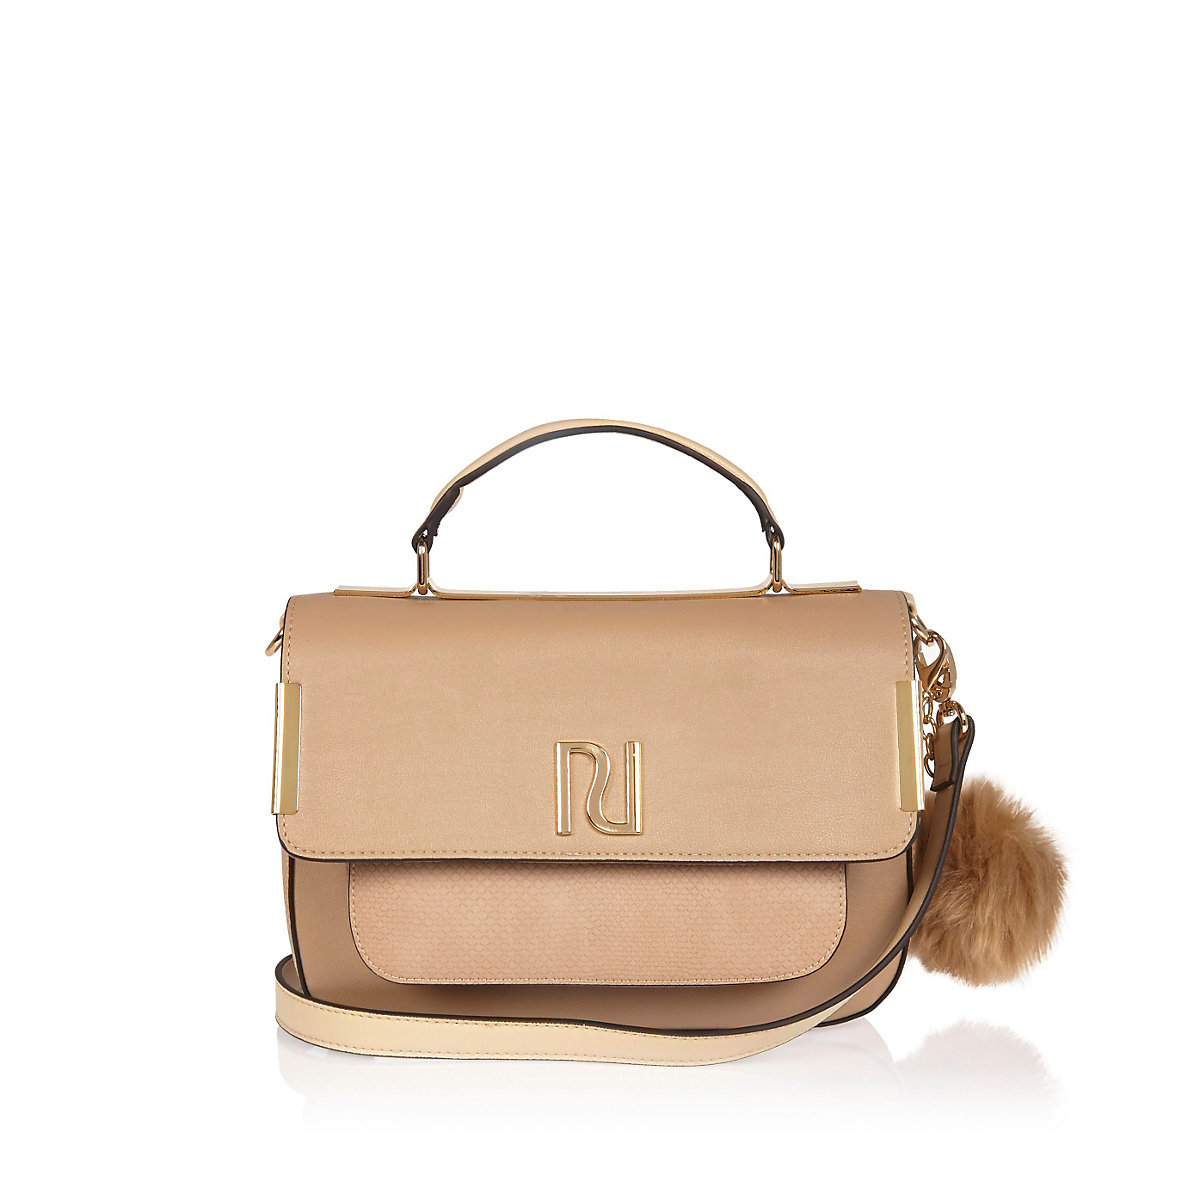 Beige RI pom pom satchel handbag